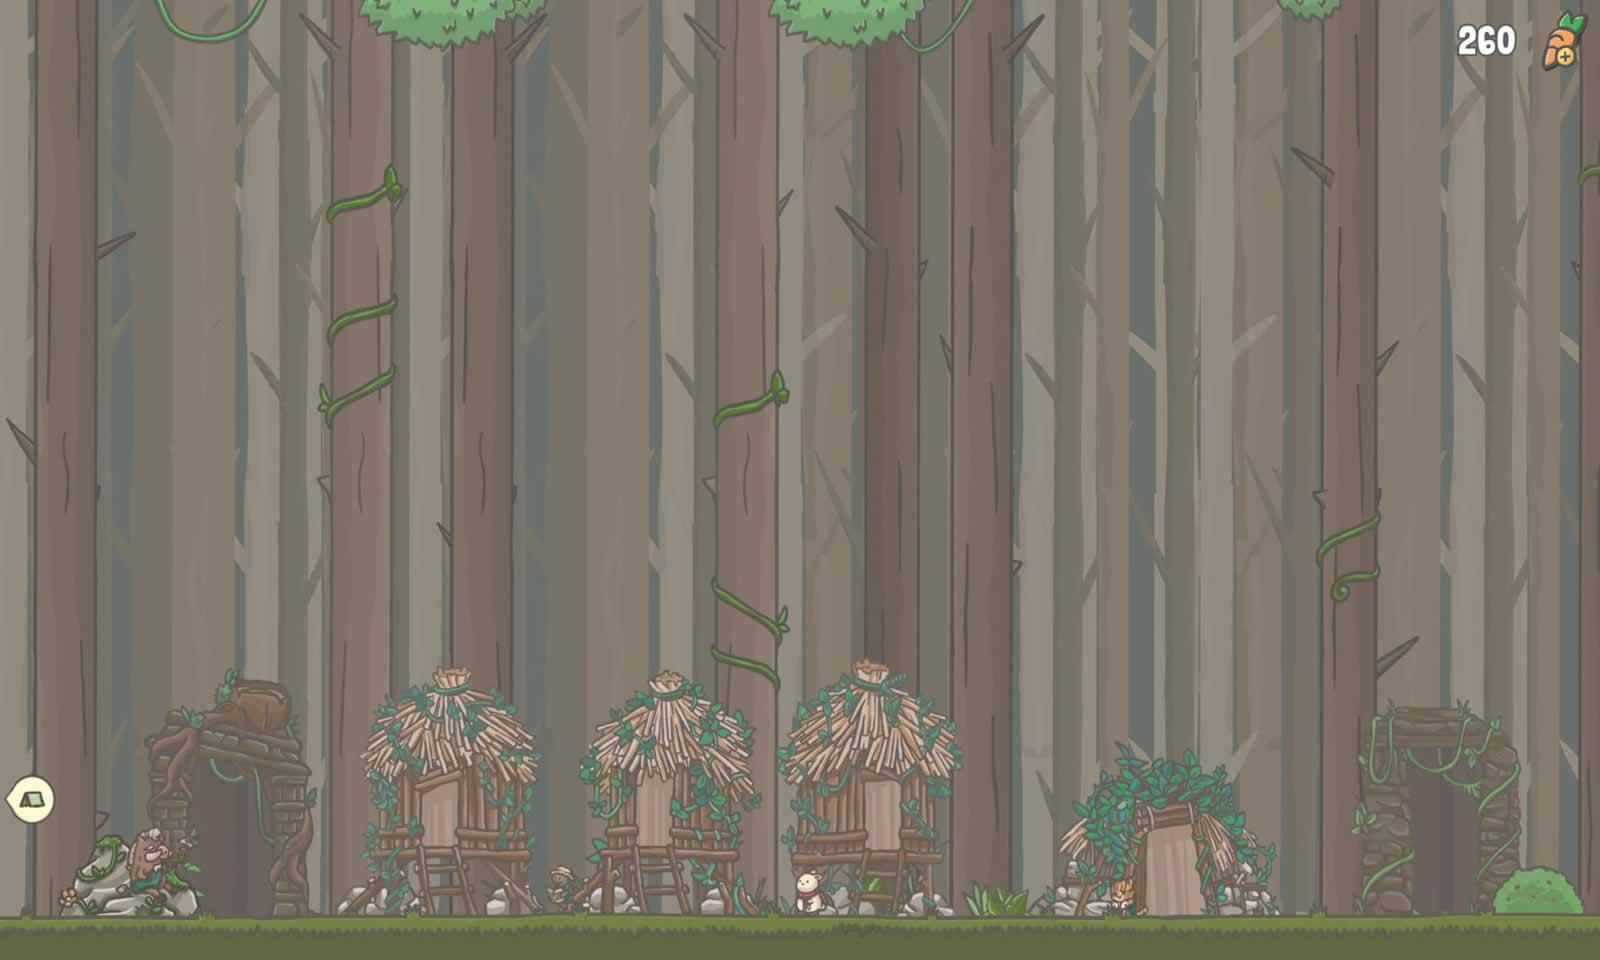 Tsuki月兔冒险破解版v1.7.2游戏截图